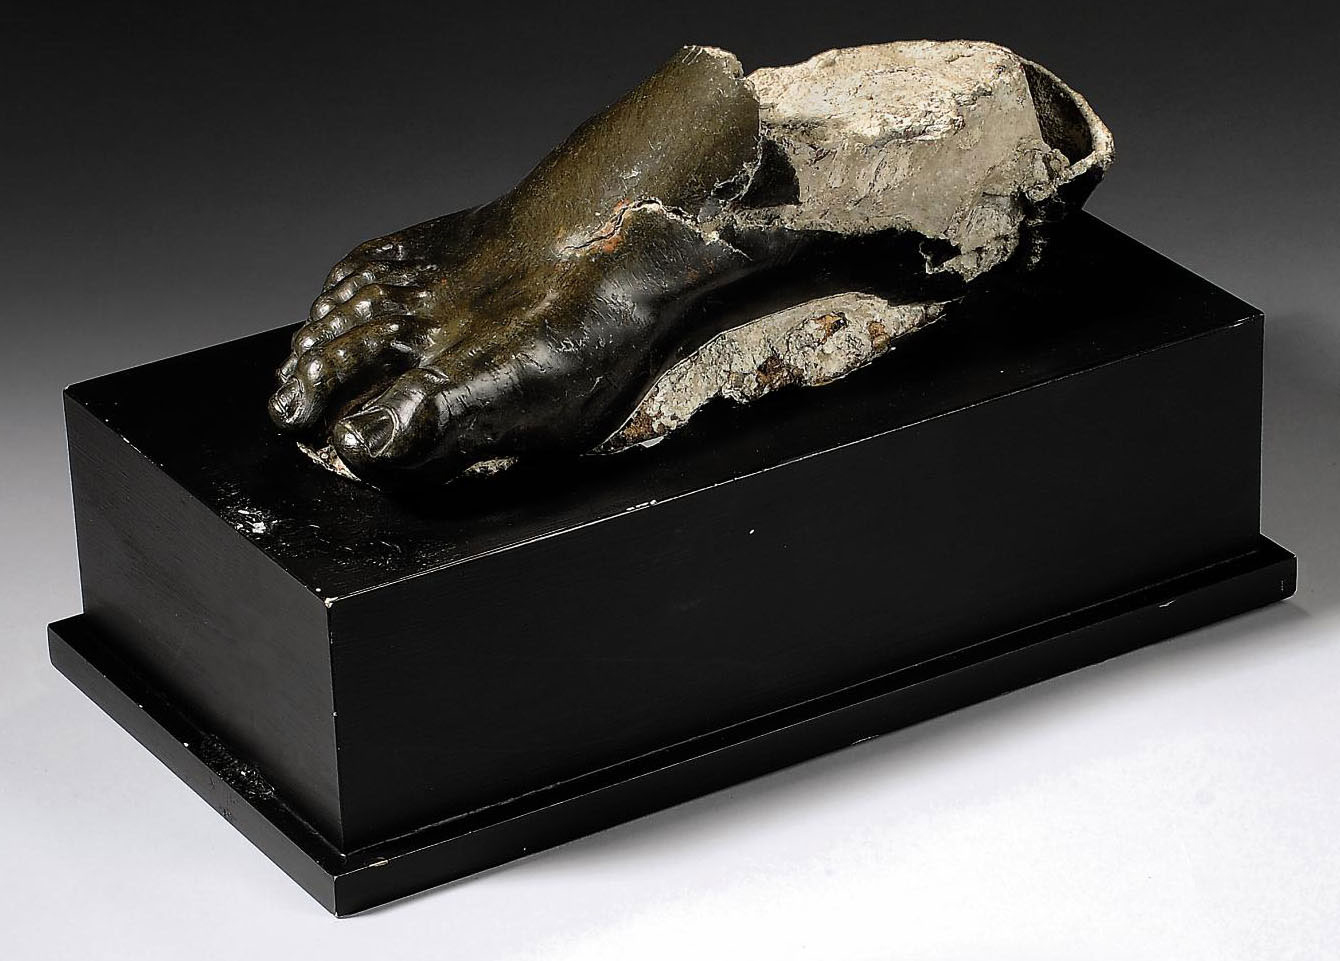 A ROMAN BRONZE RIGHT FOOT